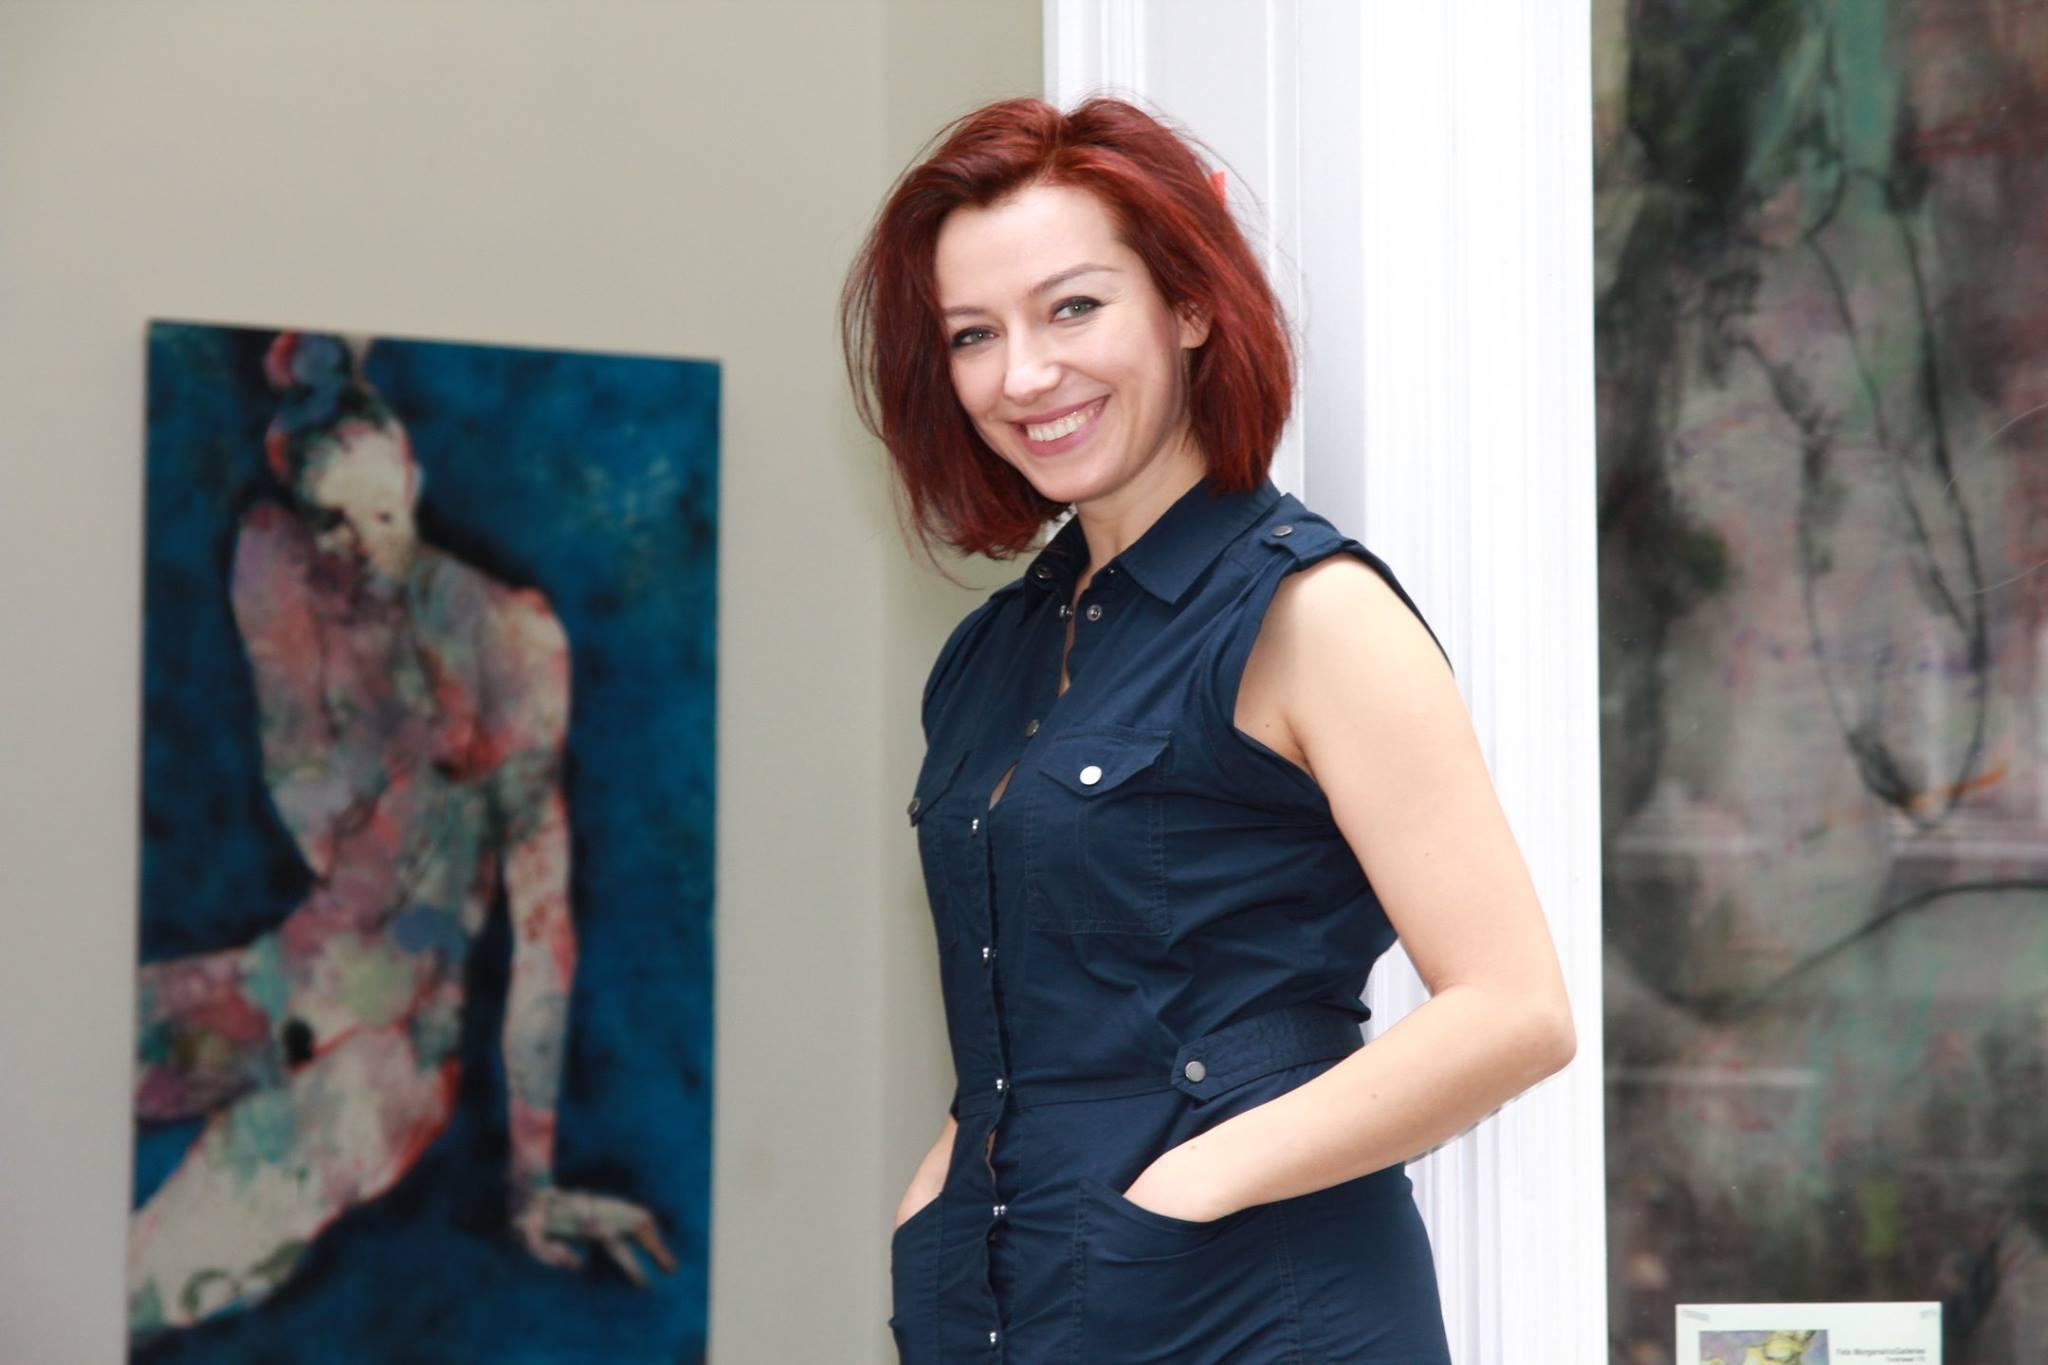 Maria Naidyonova